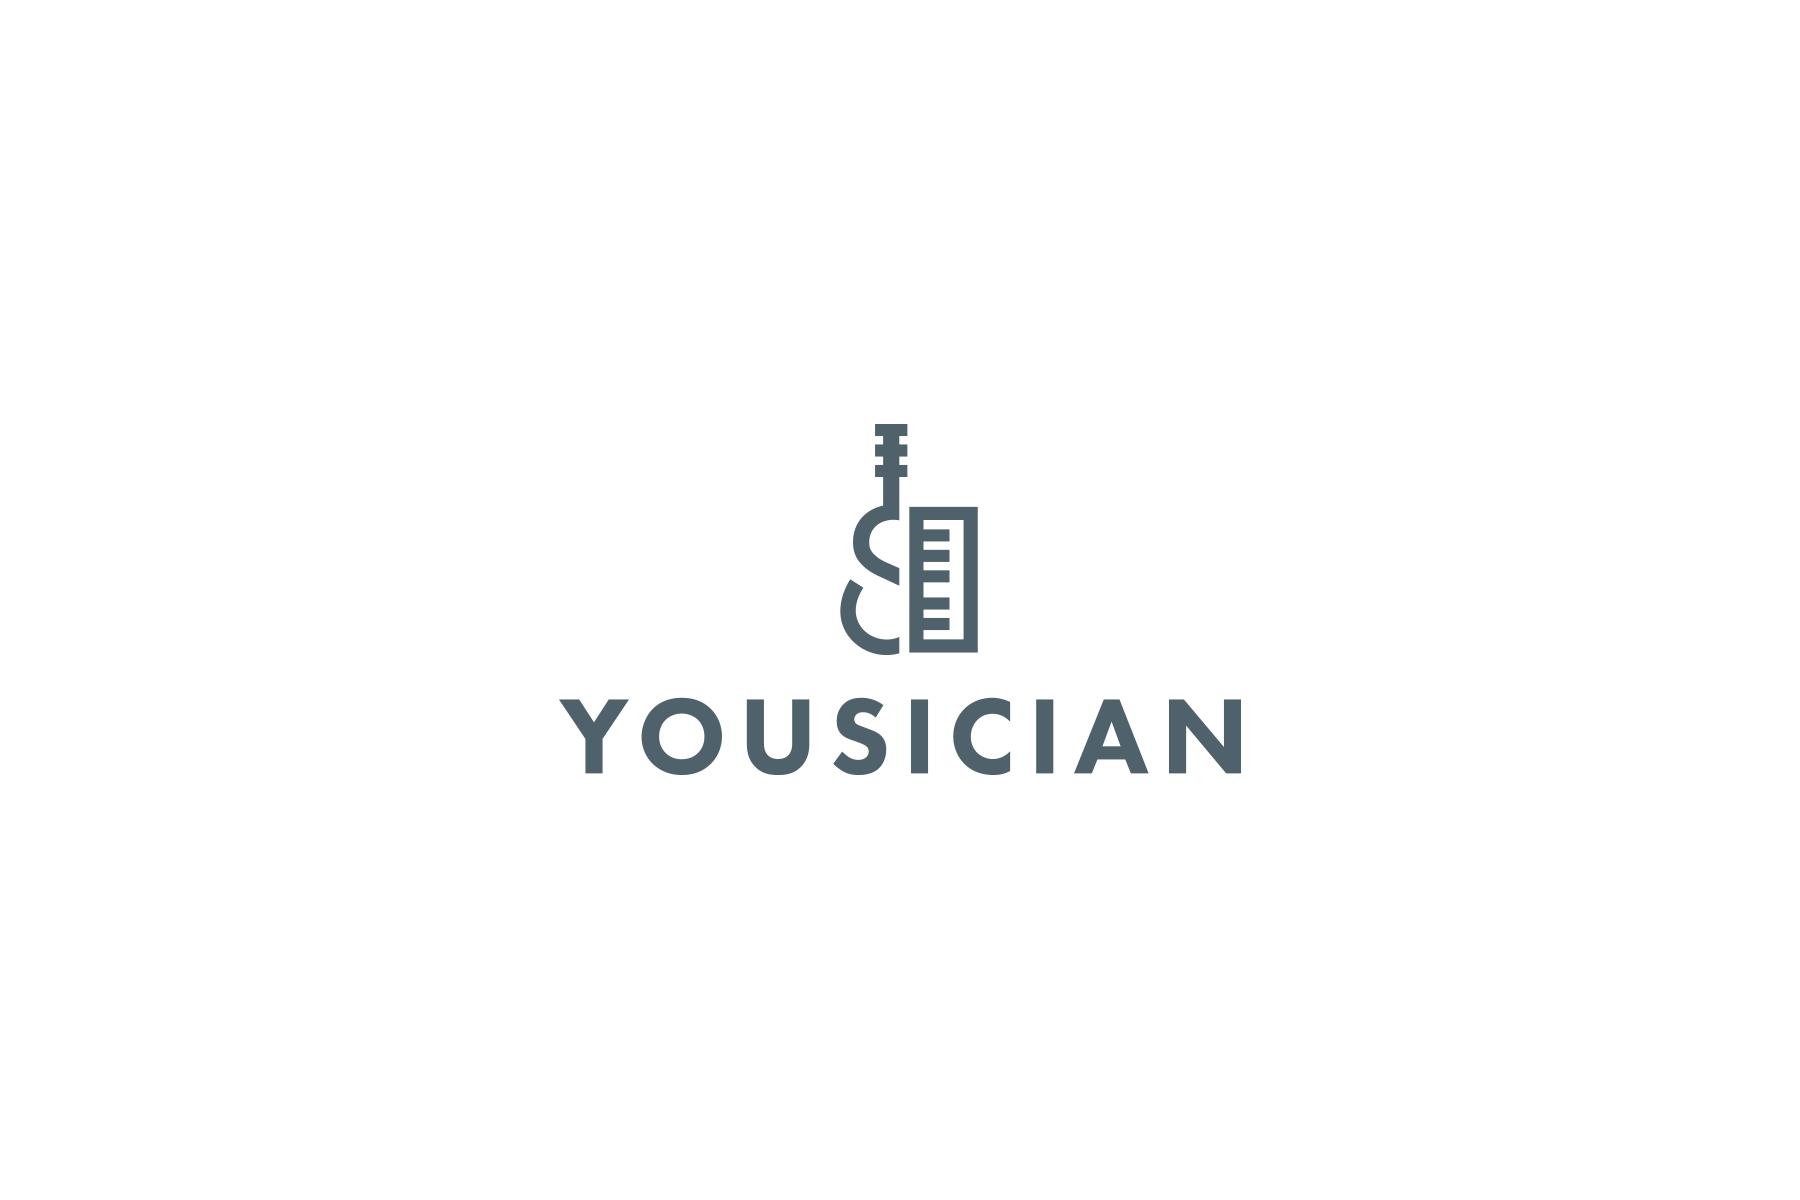 Yousician | David Agier